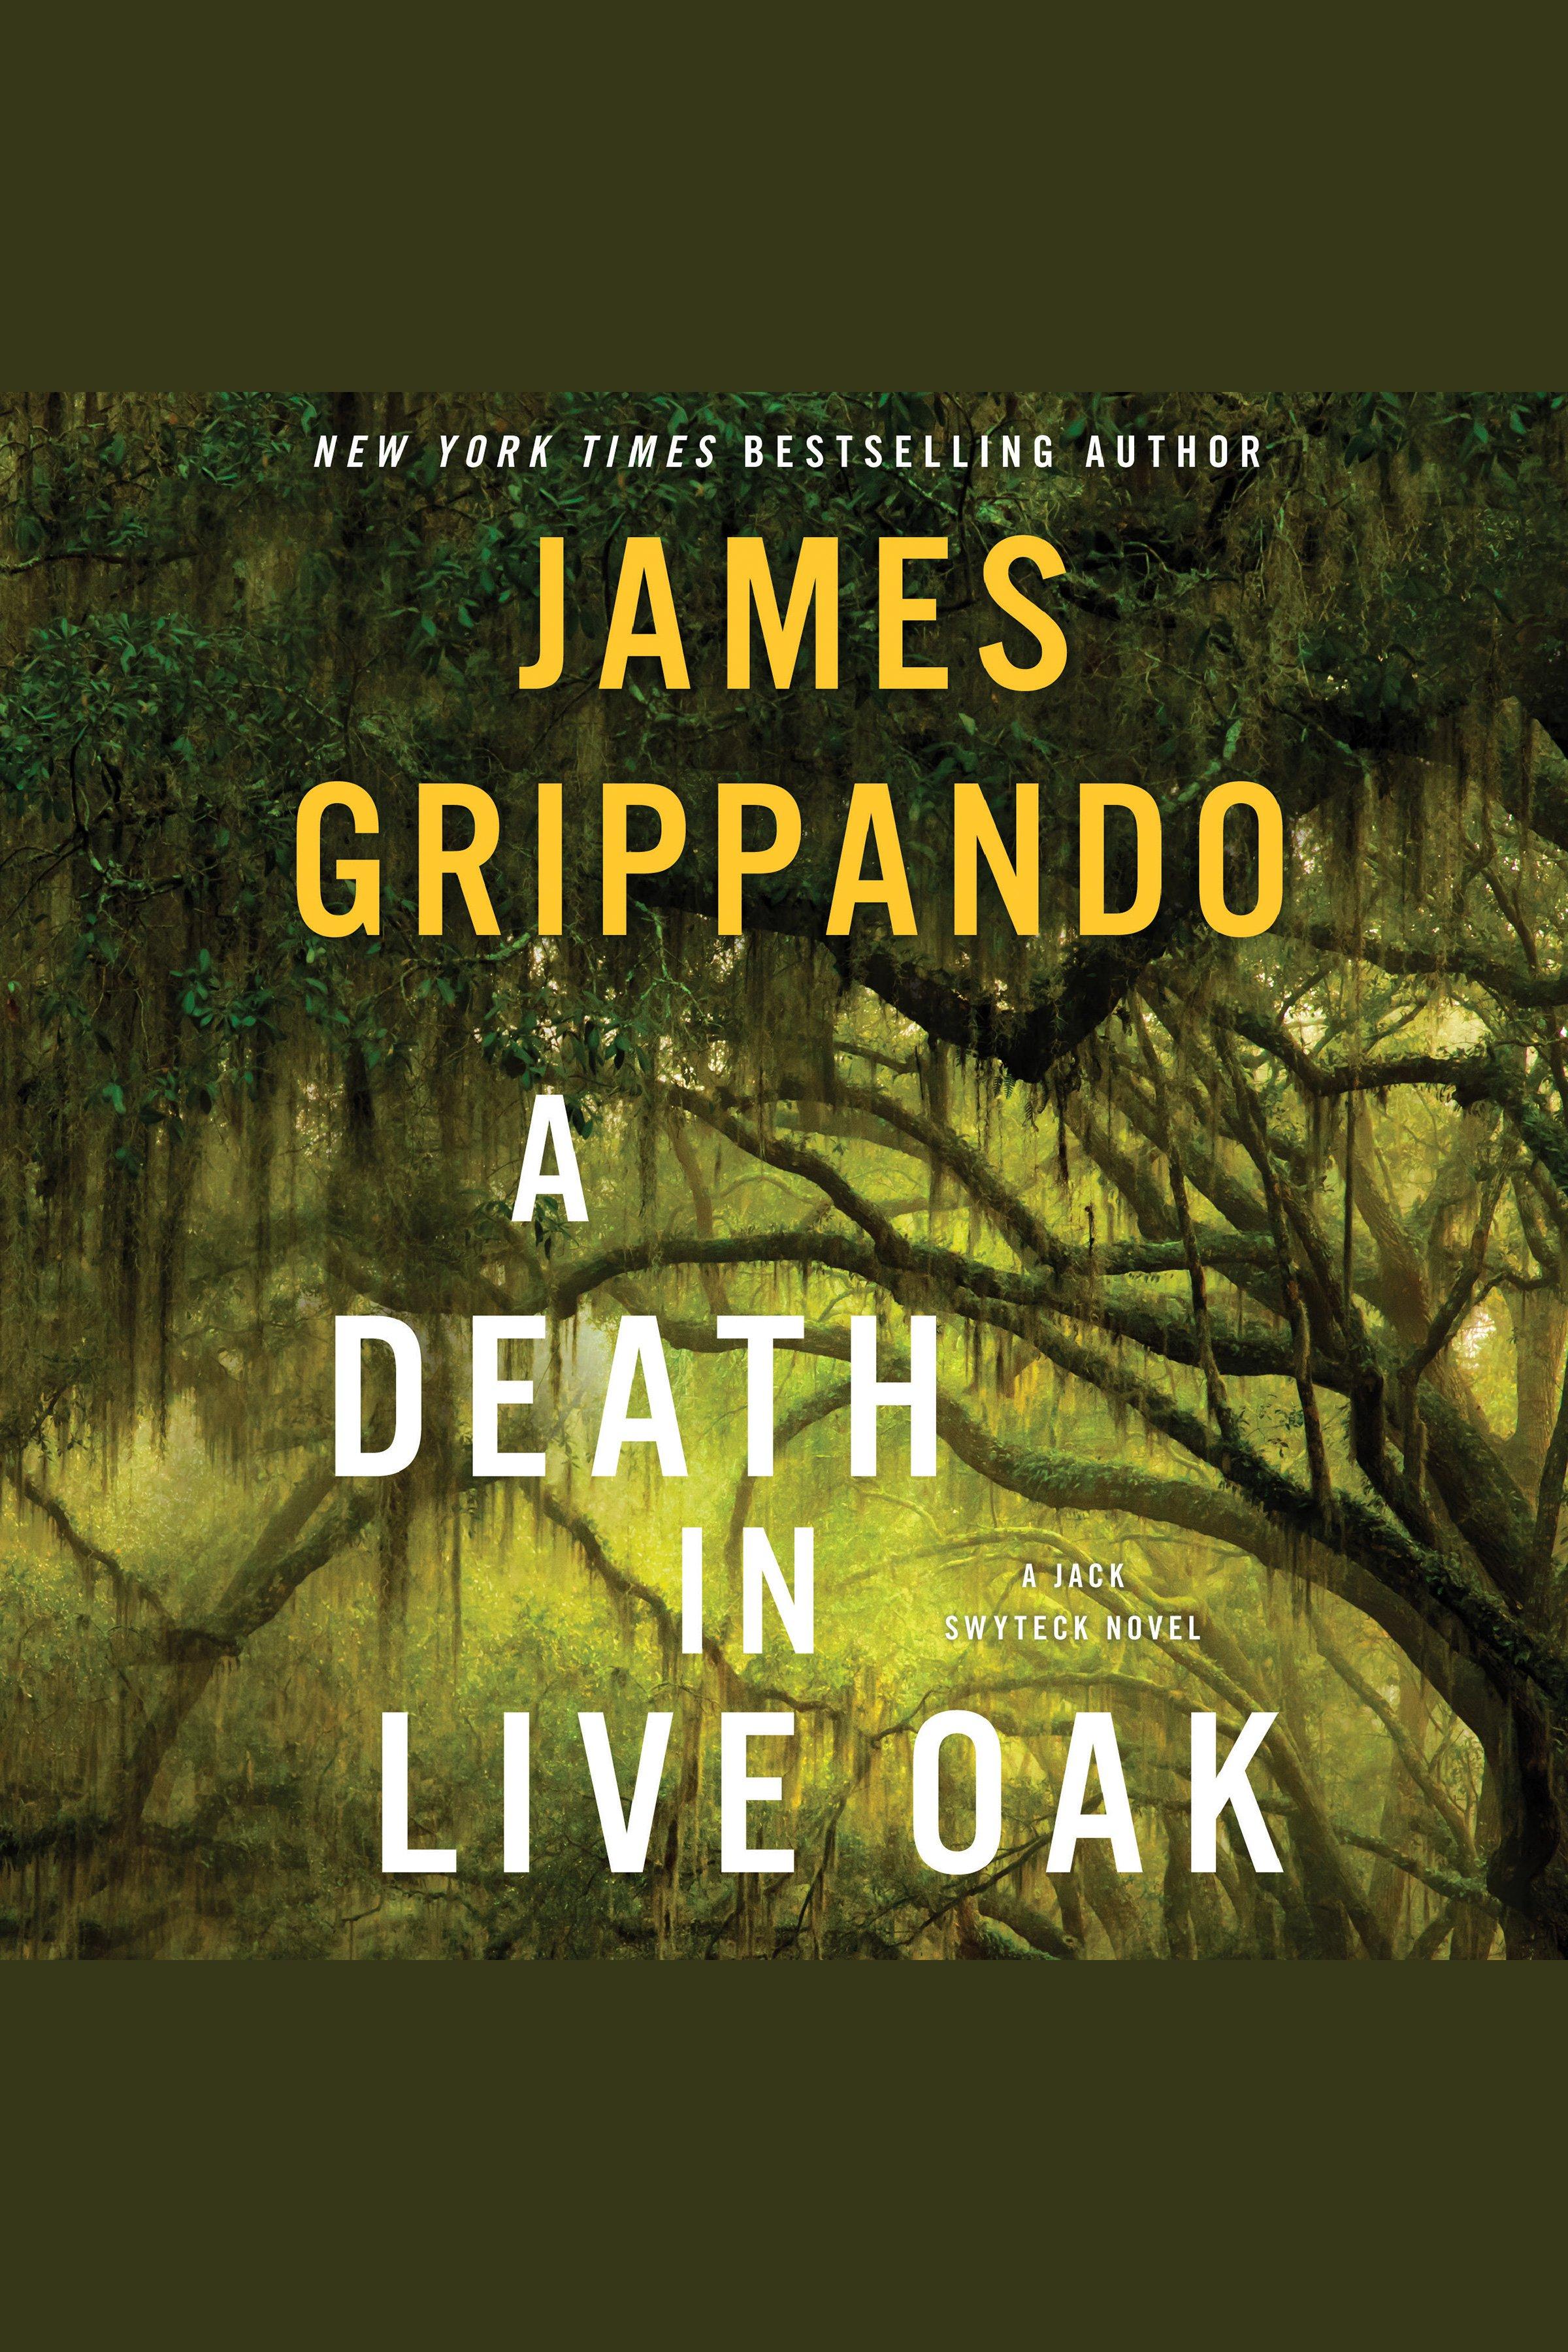 A death in Live Oak A Jack Swyteck Novel cover image